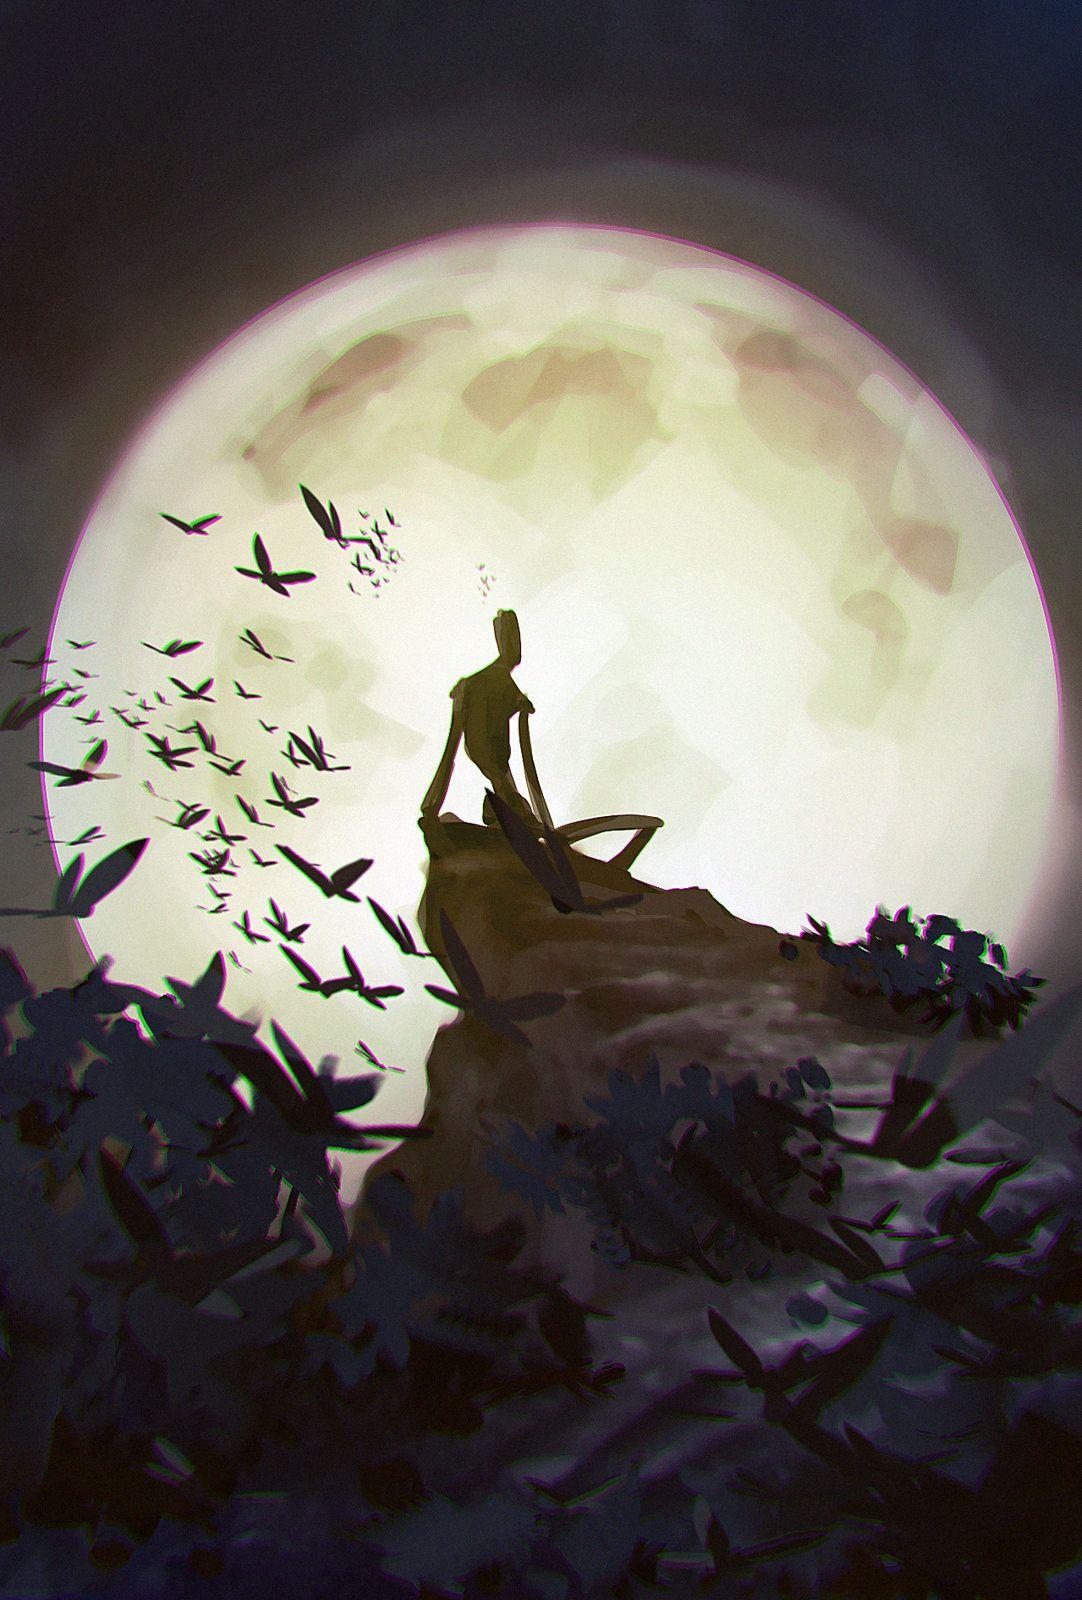 Full moon, Martin Nebelong on ArtStation at https://www.artstation.com/artwork/full-moon-0532b4ea-b930-498c-a1ec-7f0aa12f8269